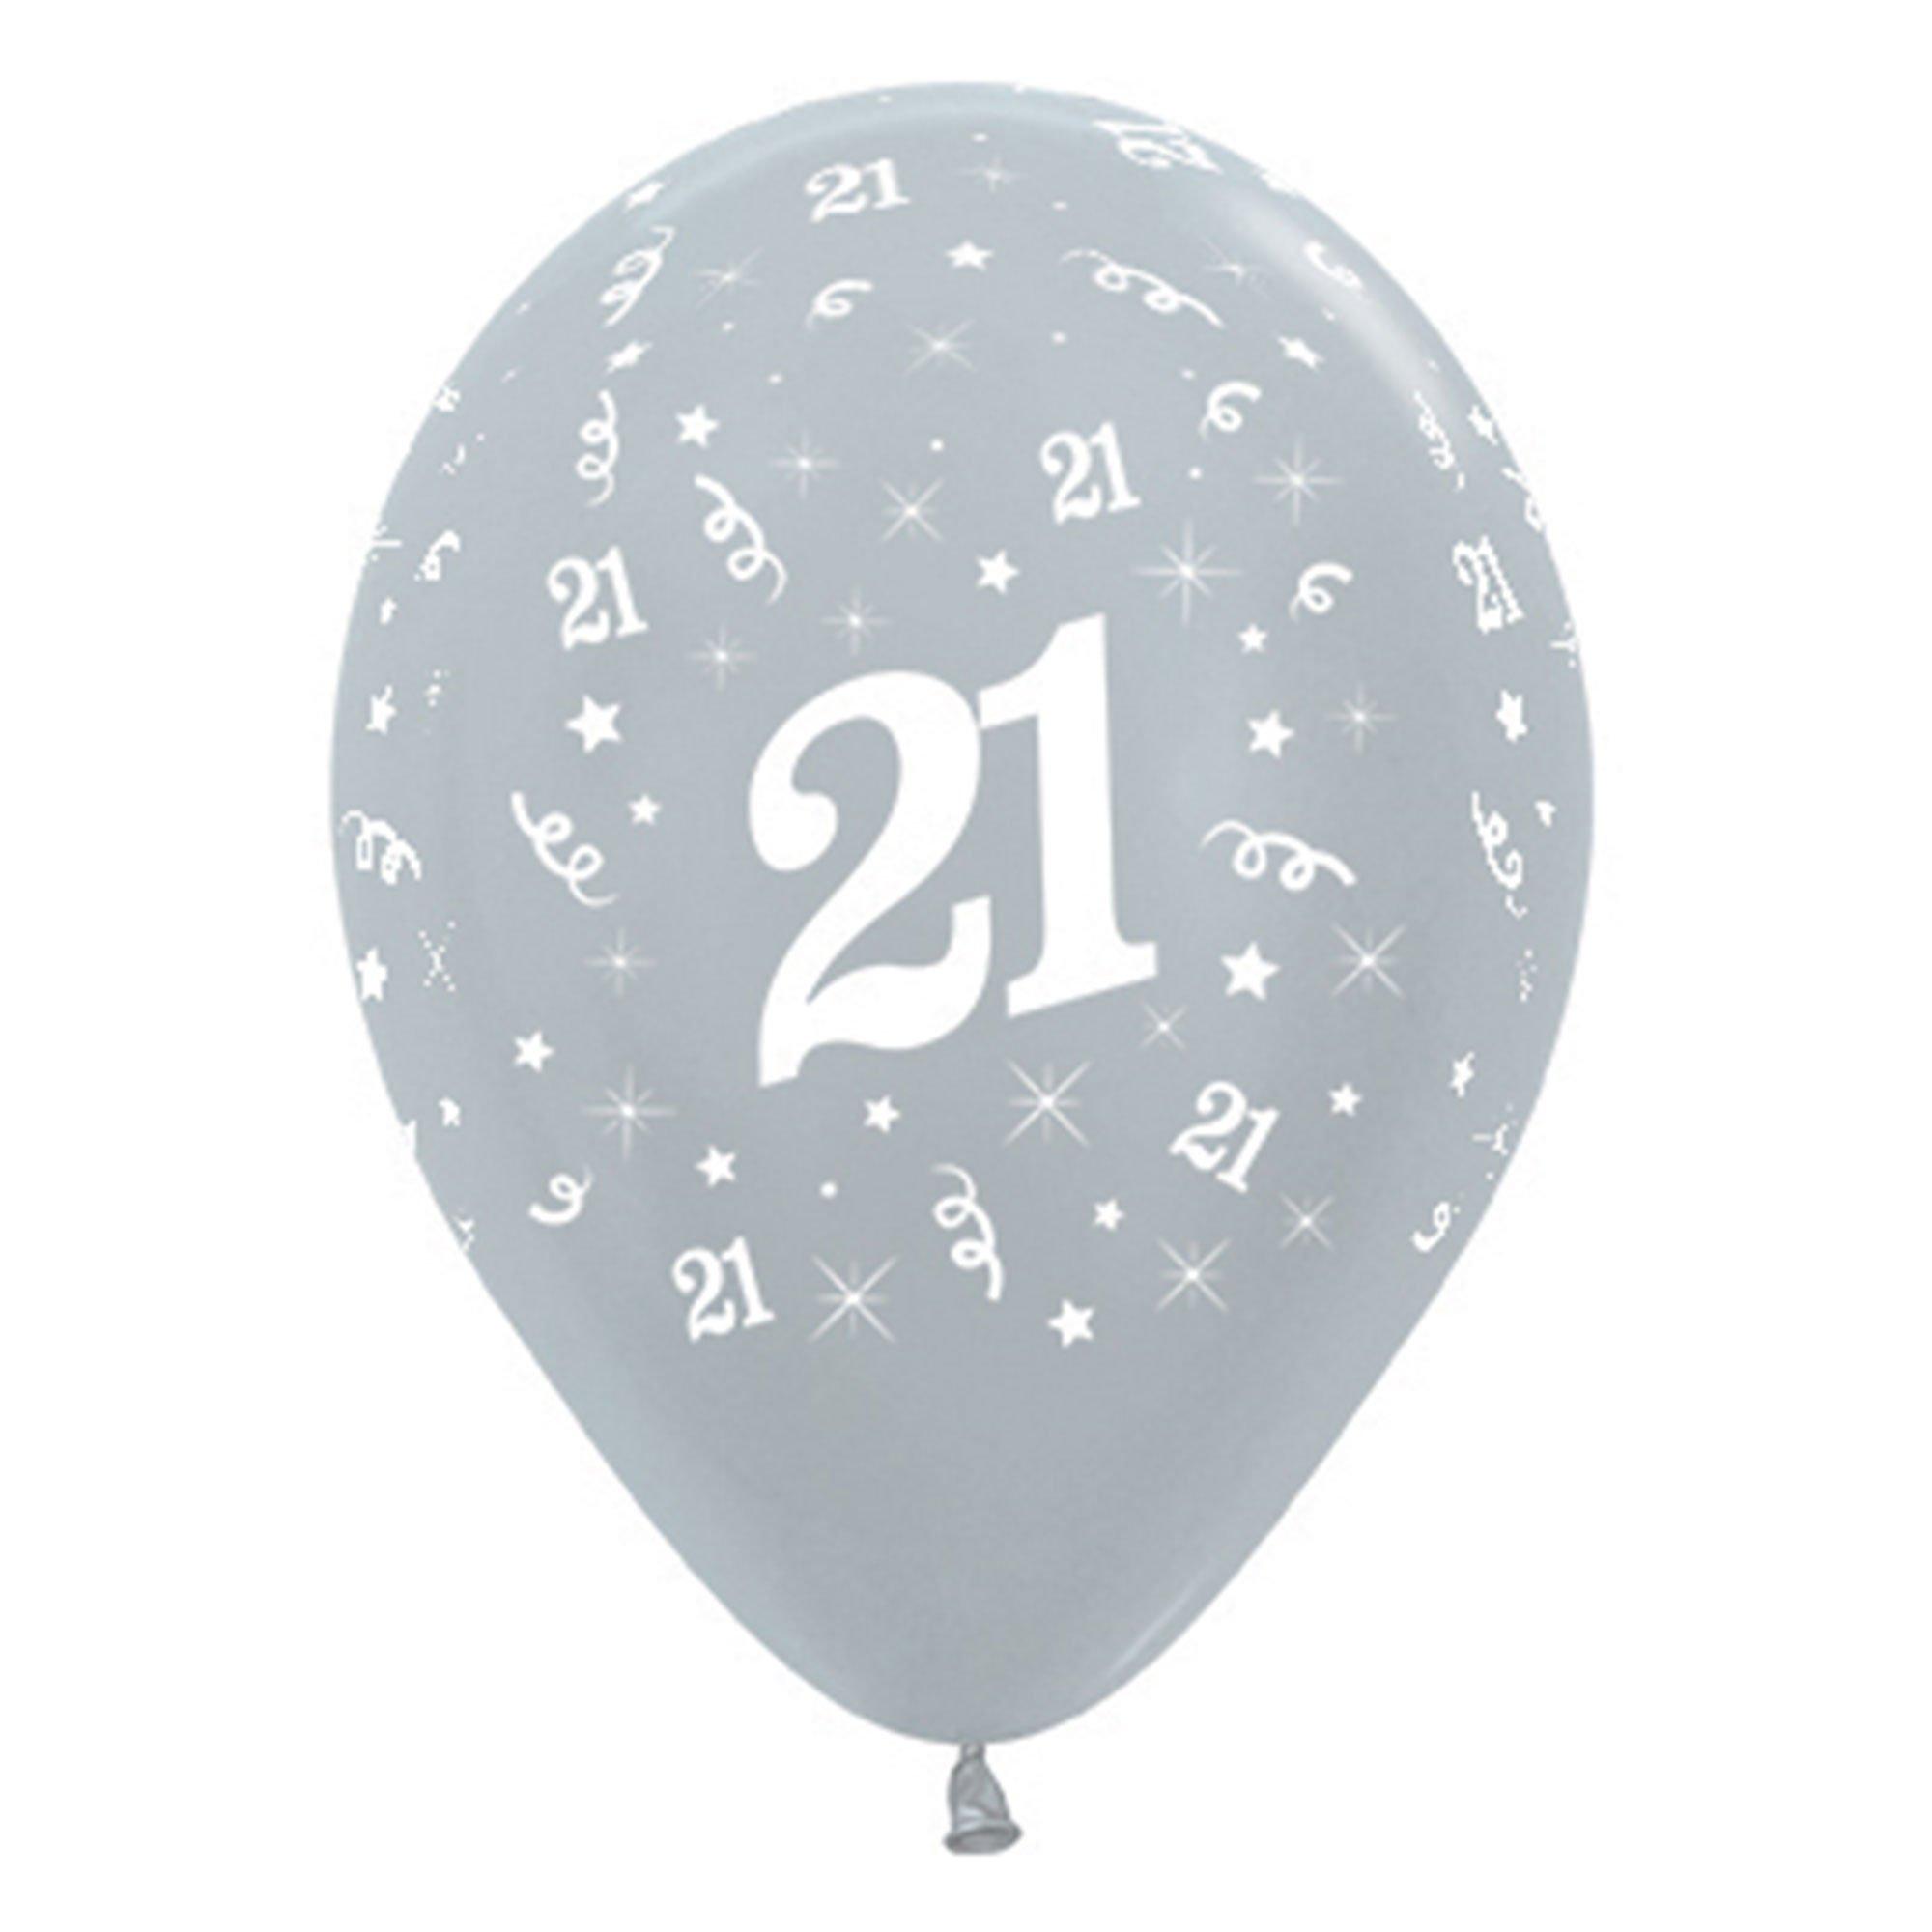 Sempertex 30cm Age 21 Satin Pearl Silver Latex Balloons, 6PK